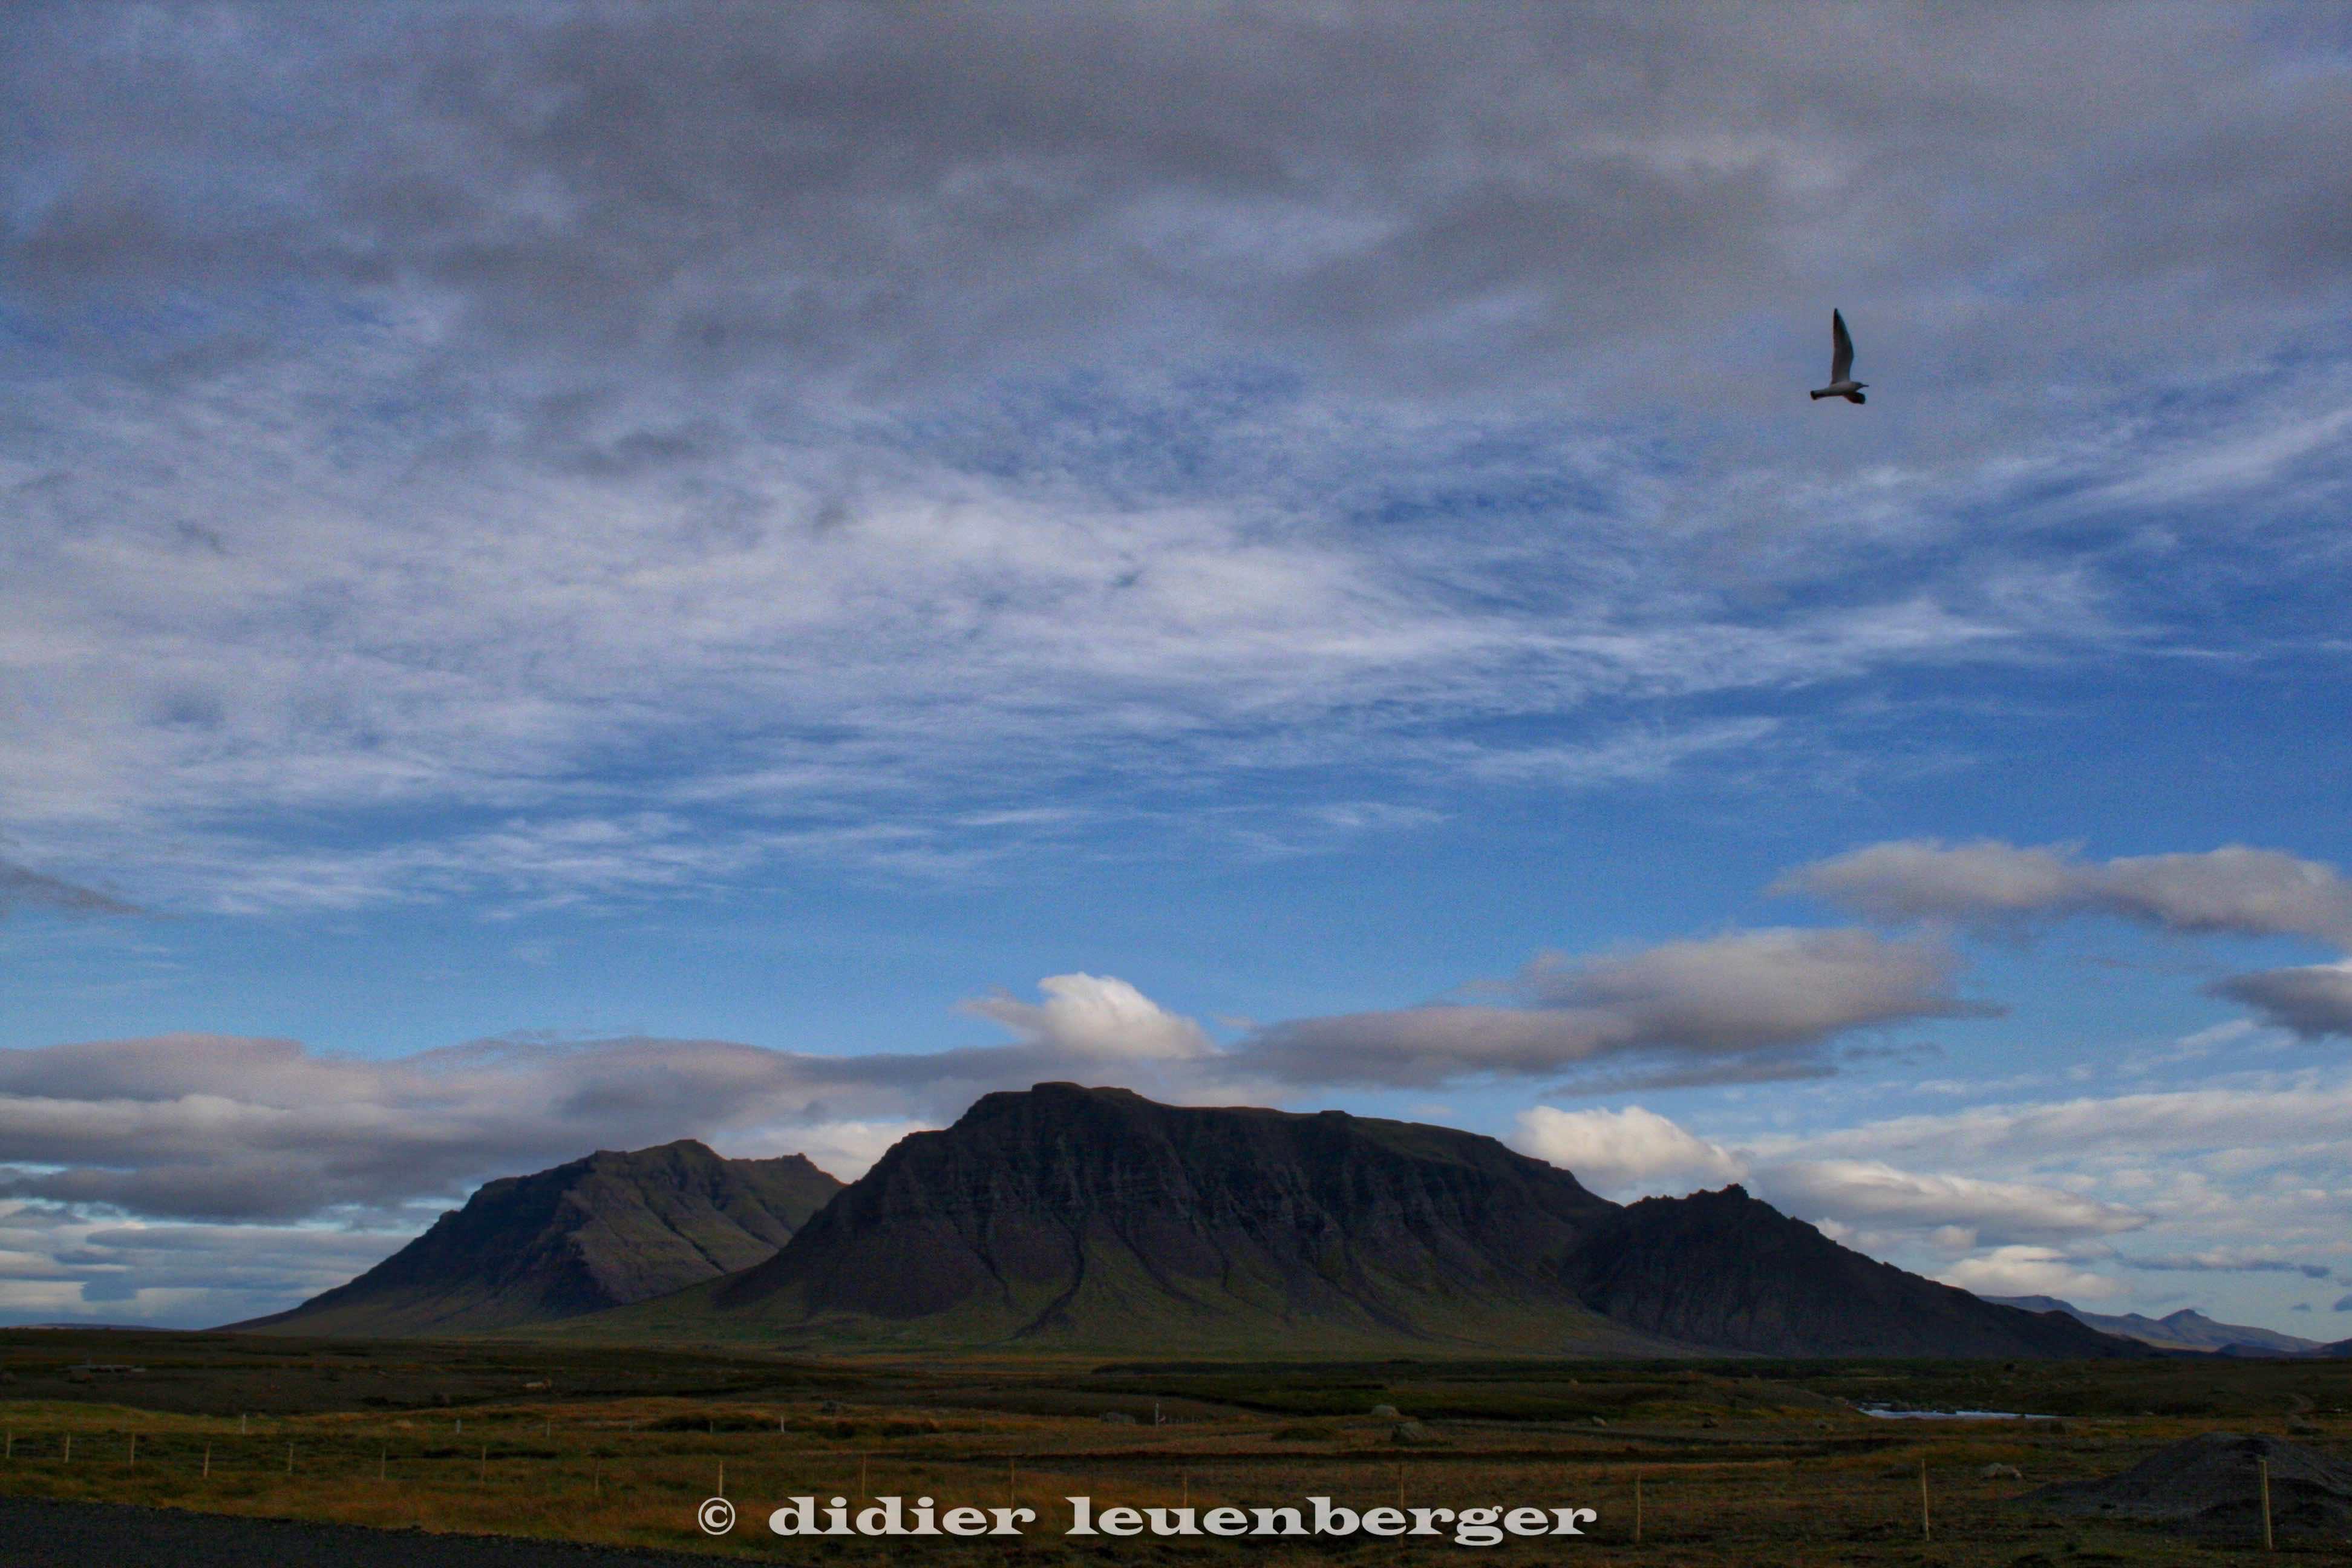 ISLANDE 09.2008 209_HDR2.jpg